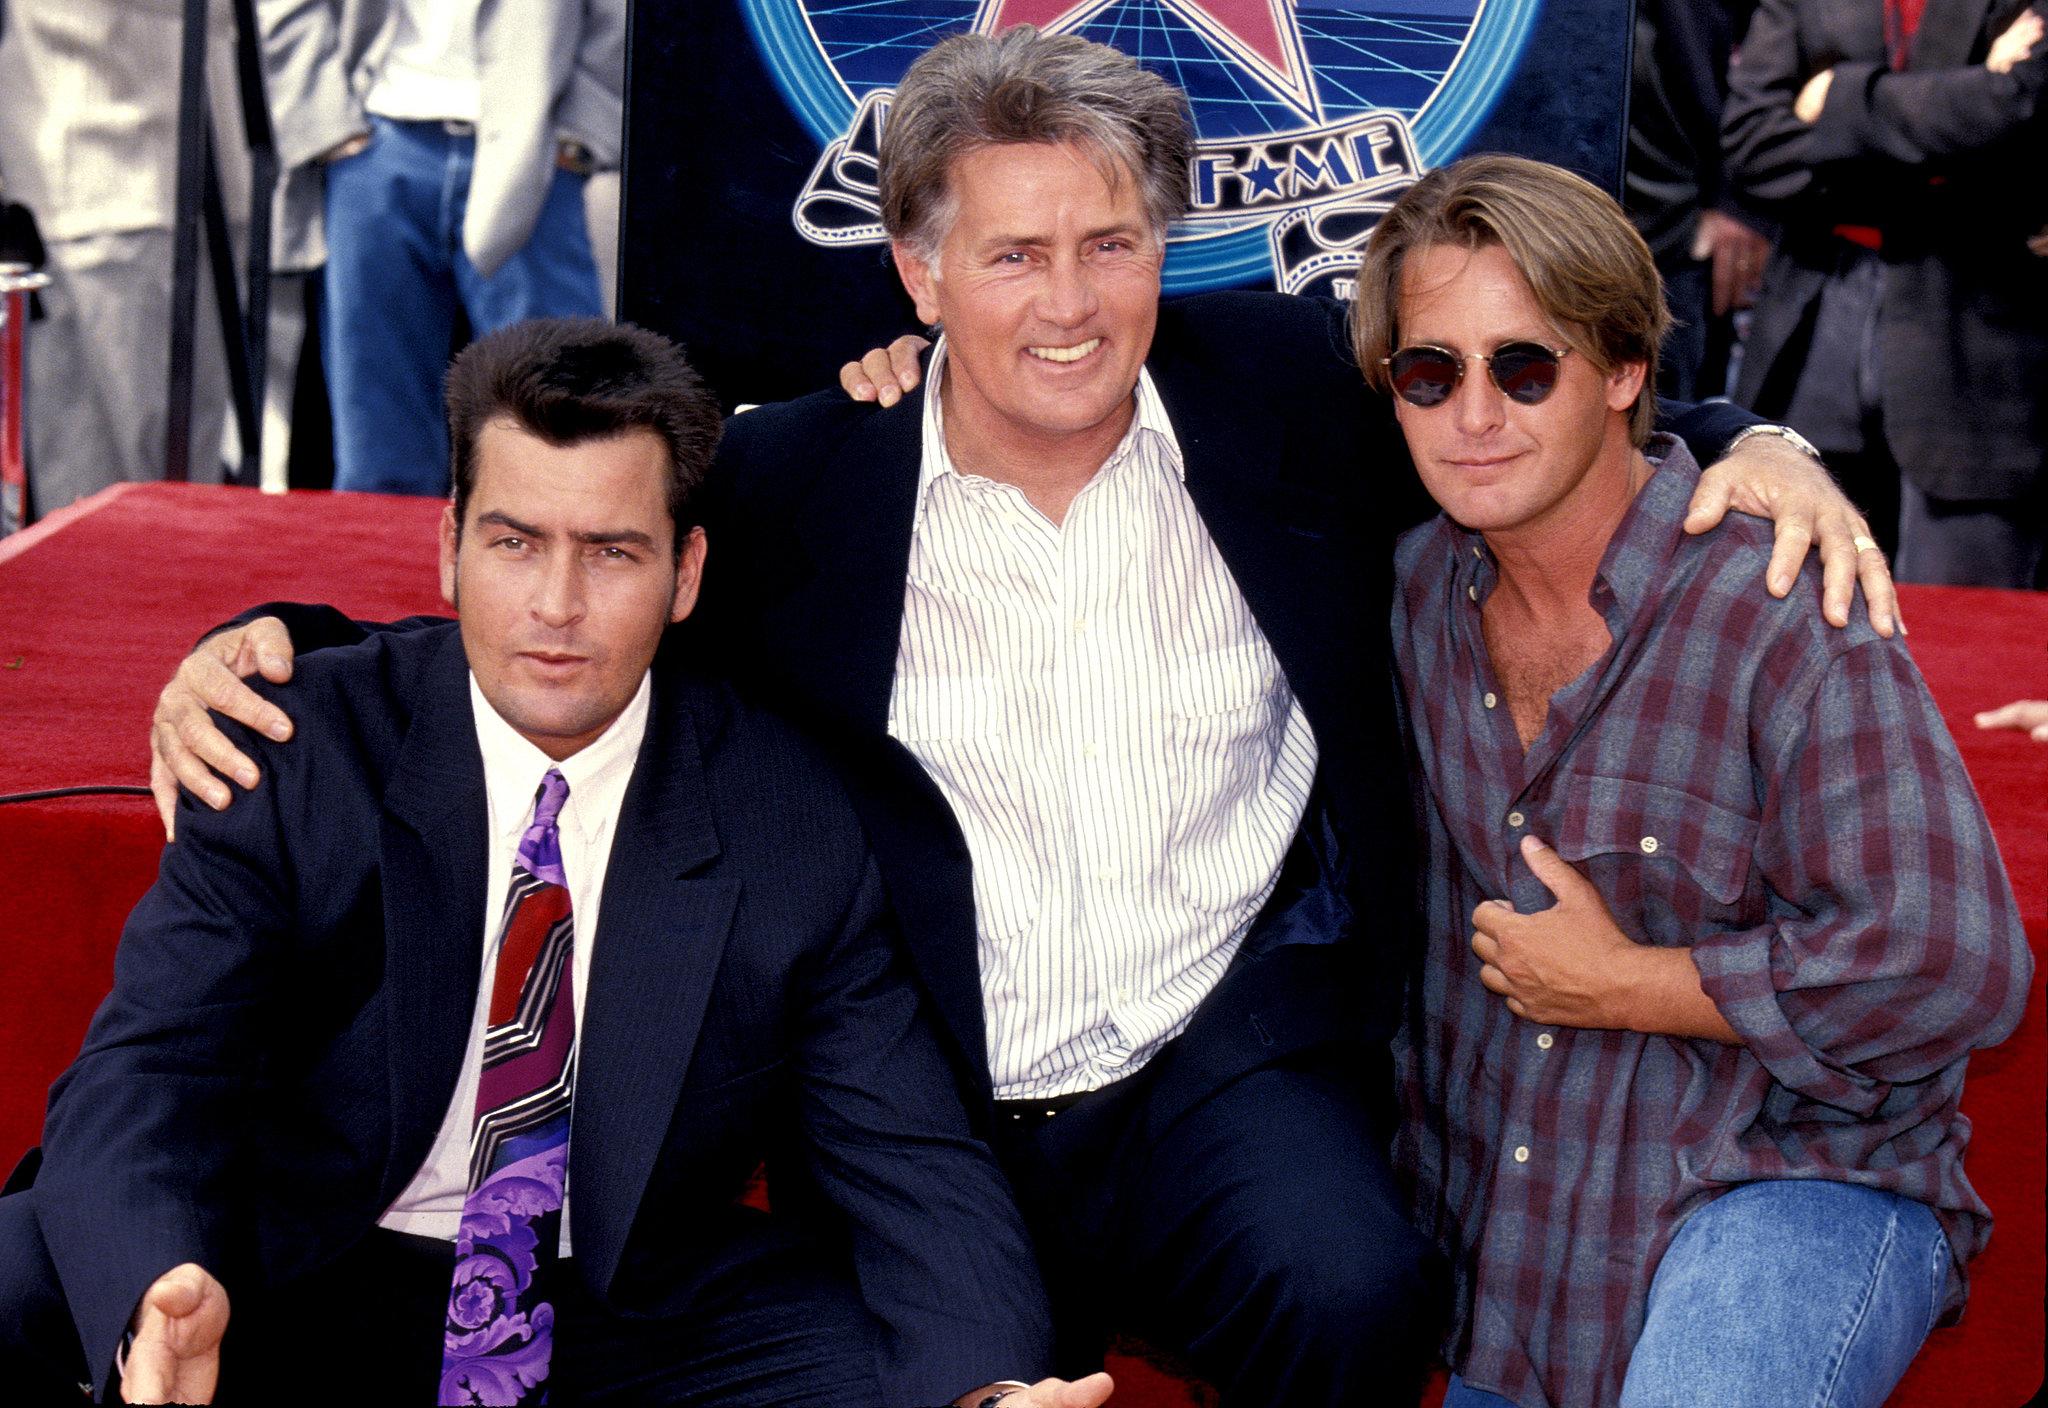 Martin-Sheen-Charlie-Sheen-Emilio-Estevez.jpg